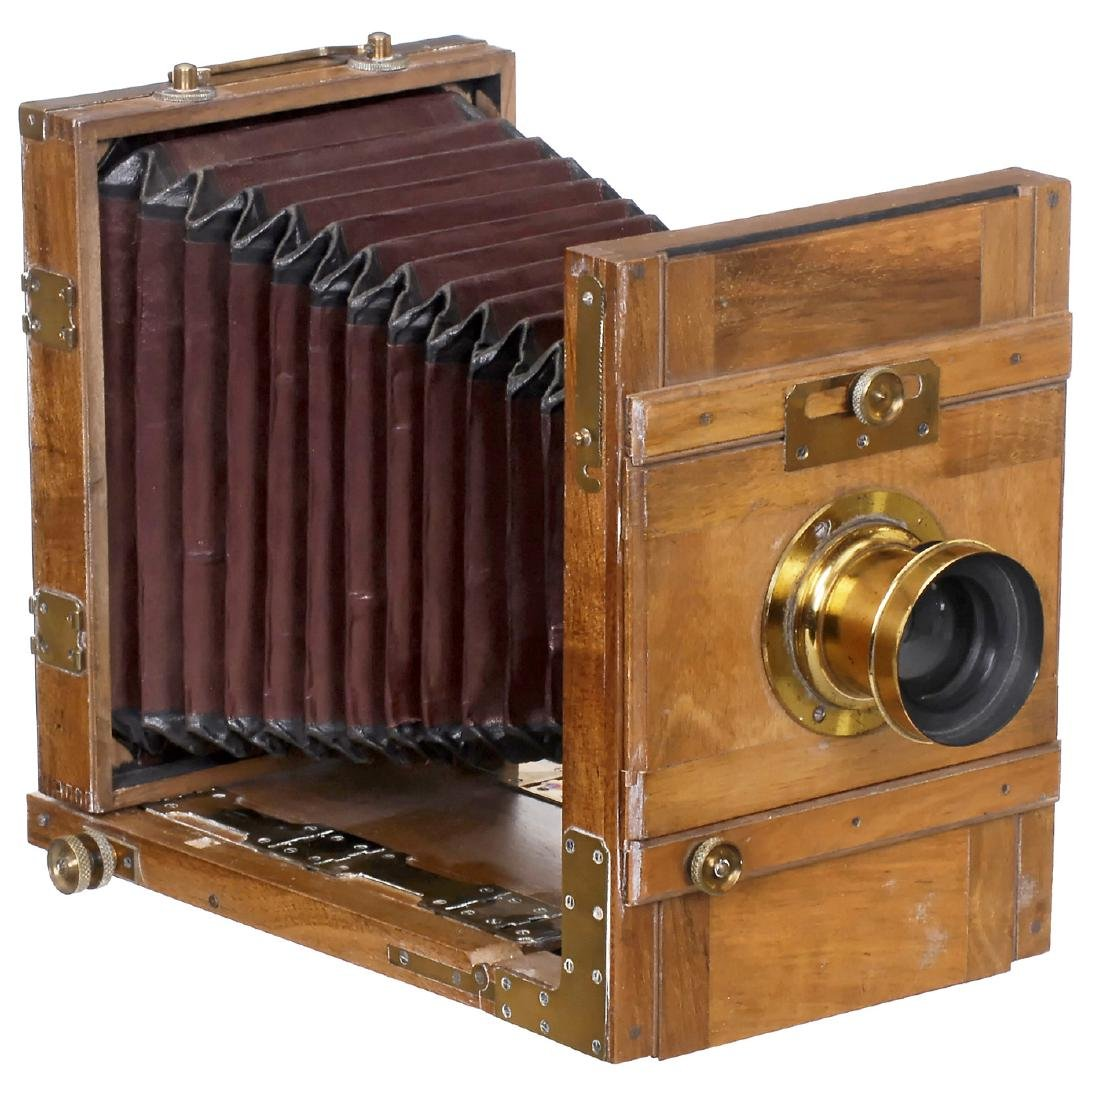 French Field Camera, c. 1880